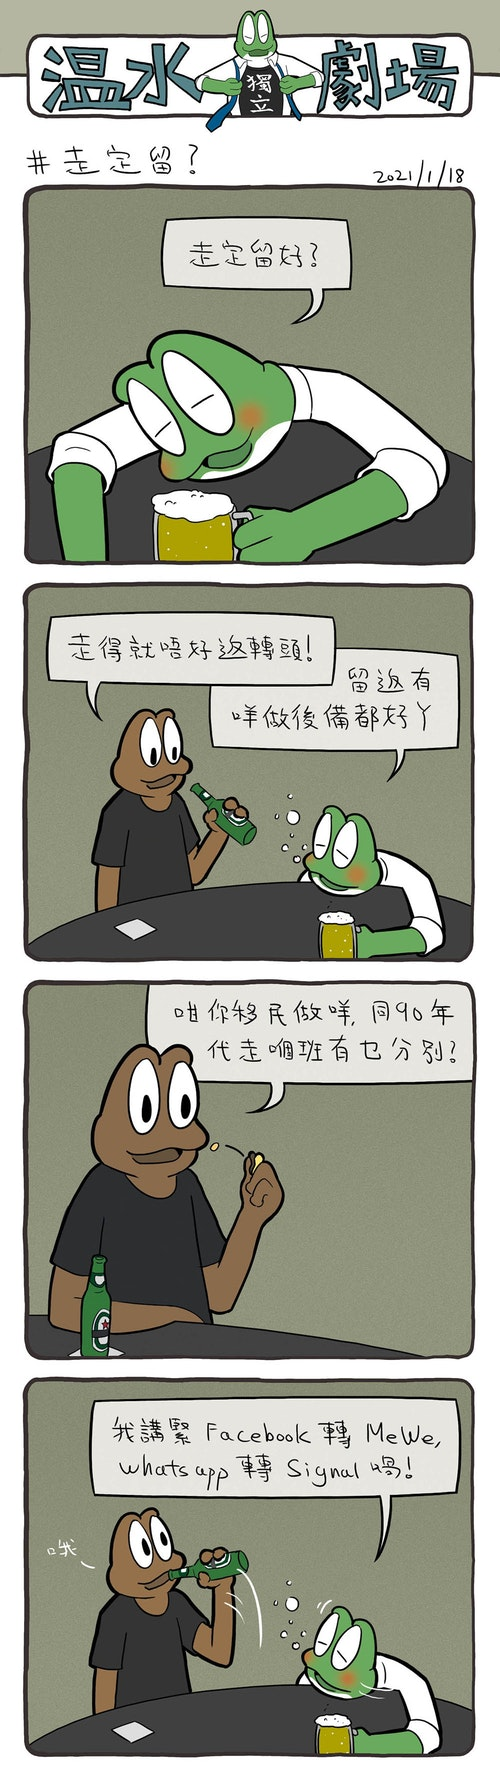 frog_news_lens_290_684